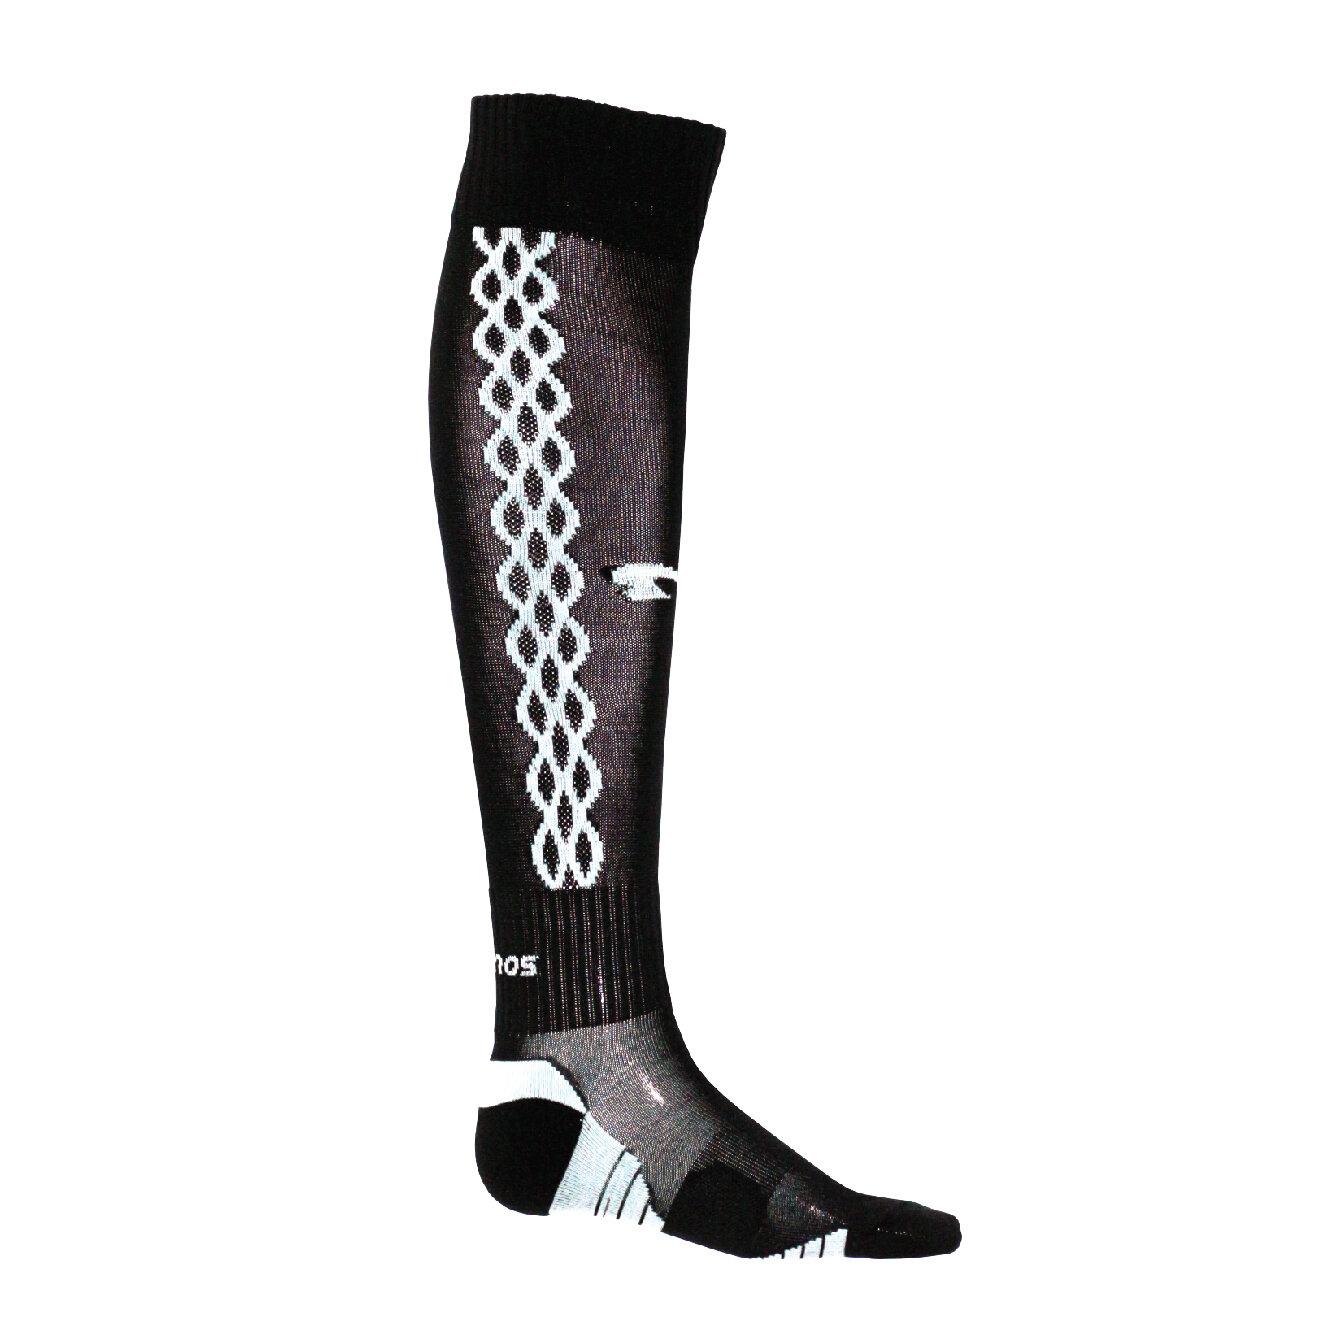 Azzurri 2 Socks